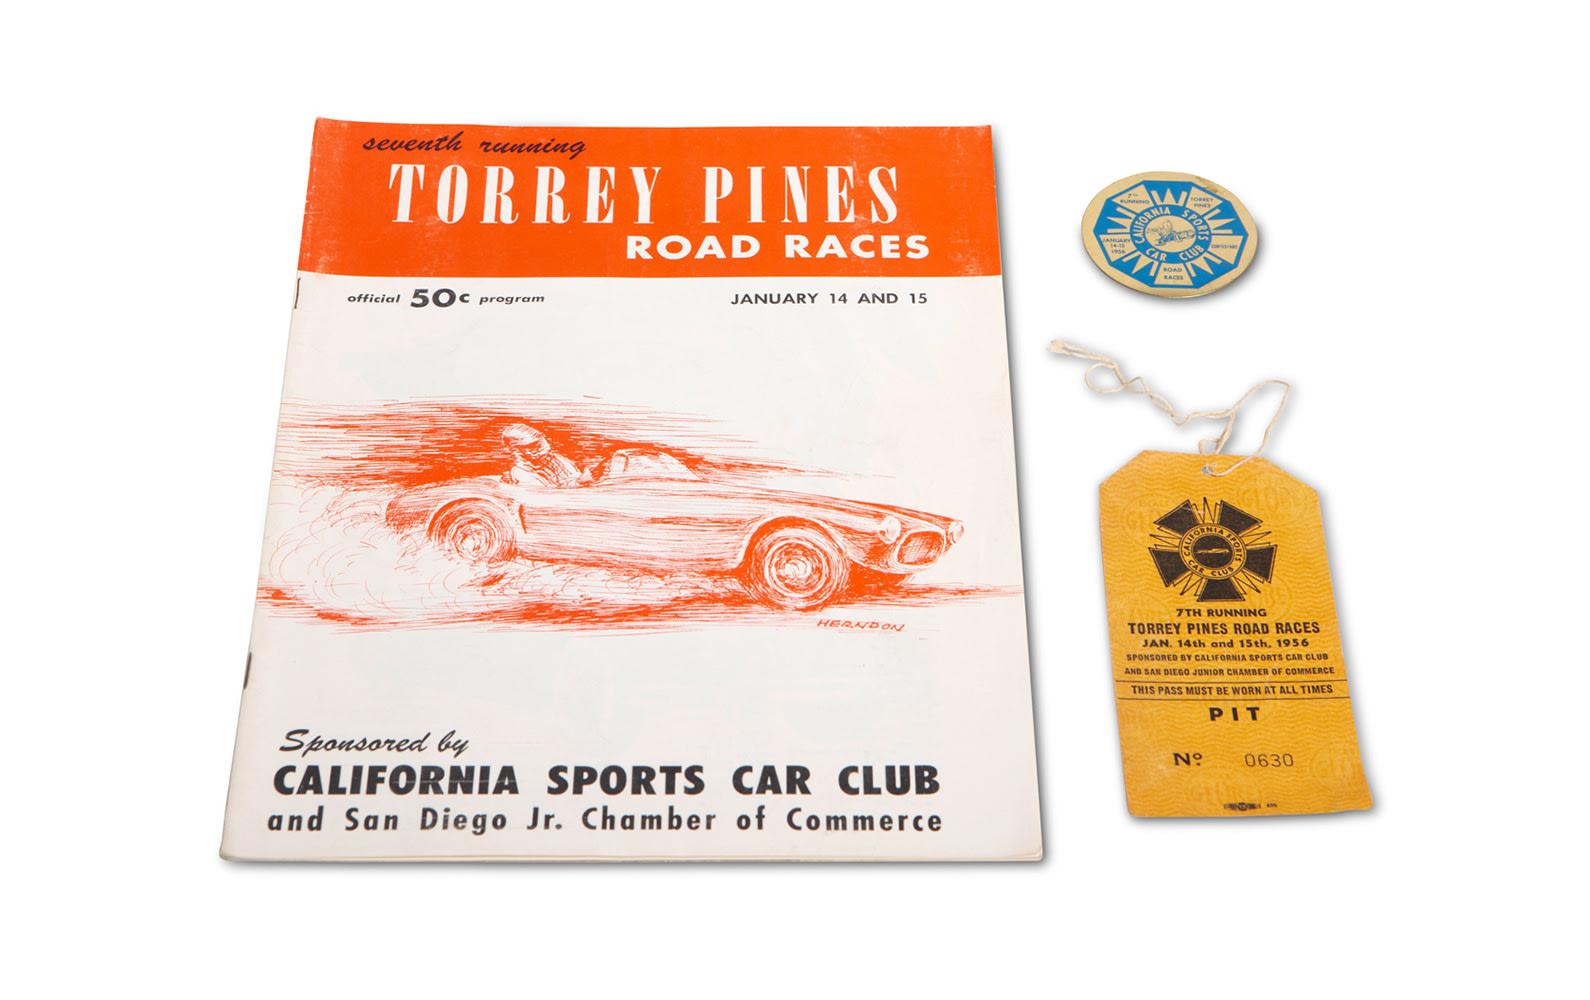 1956 CSCC Torrey Pines Road Races Program, Pit Pass, and Medallion